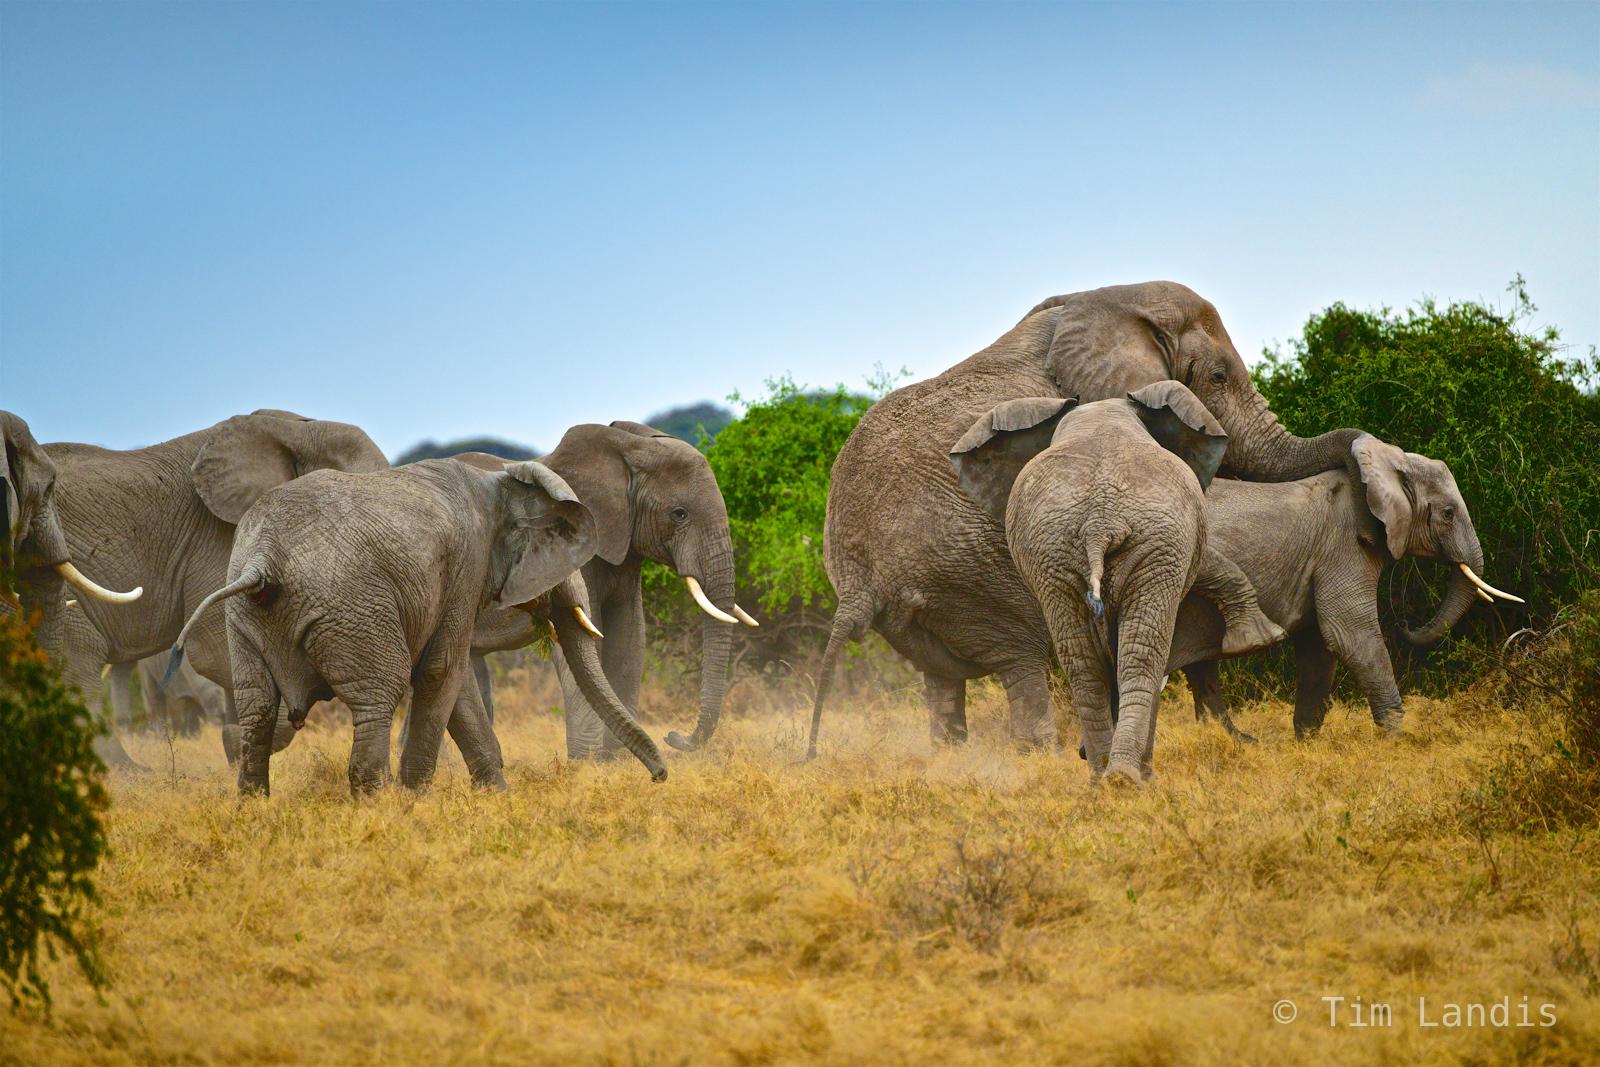 Elephants copulating, dismount, elephant love, elephants mating, elephants party, love, photo